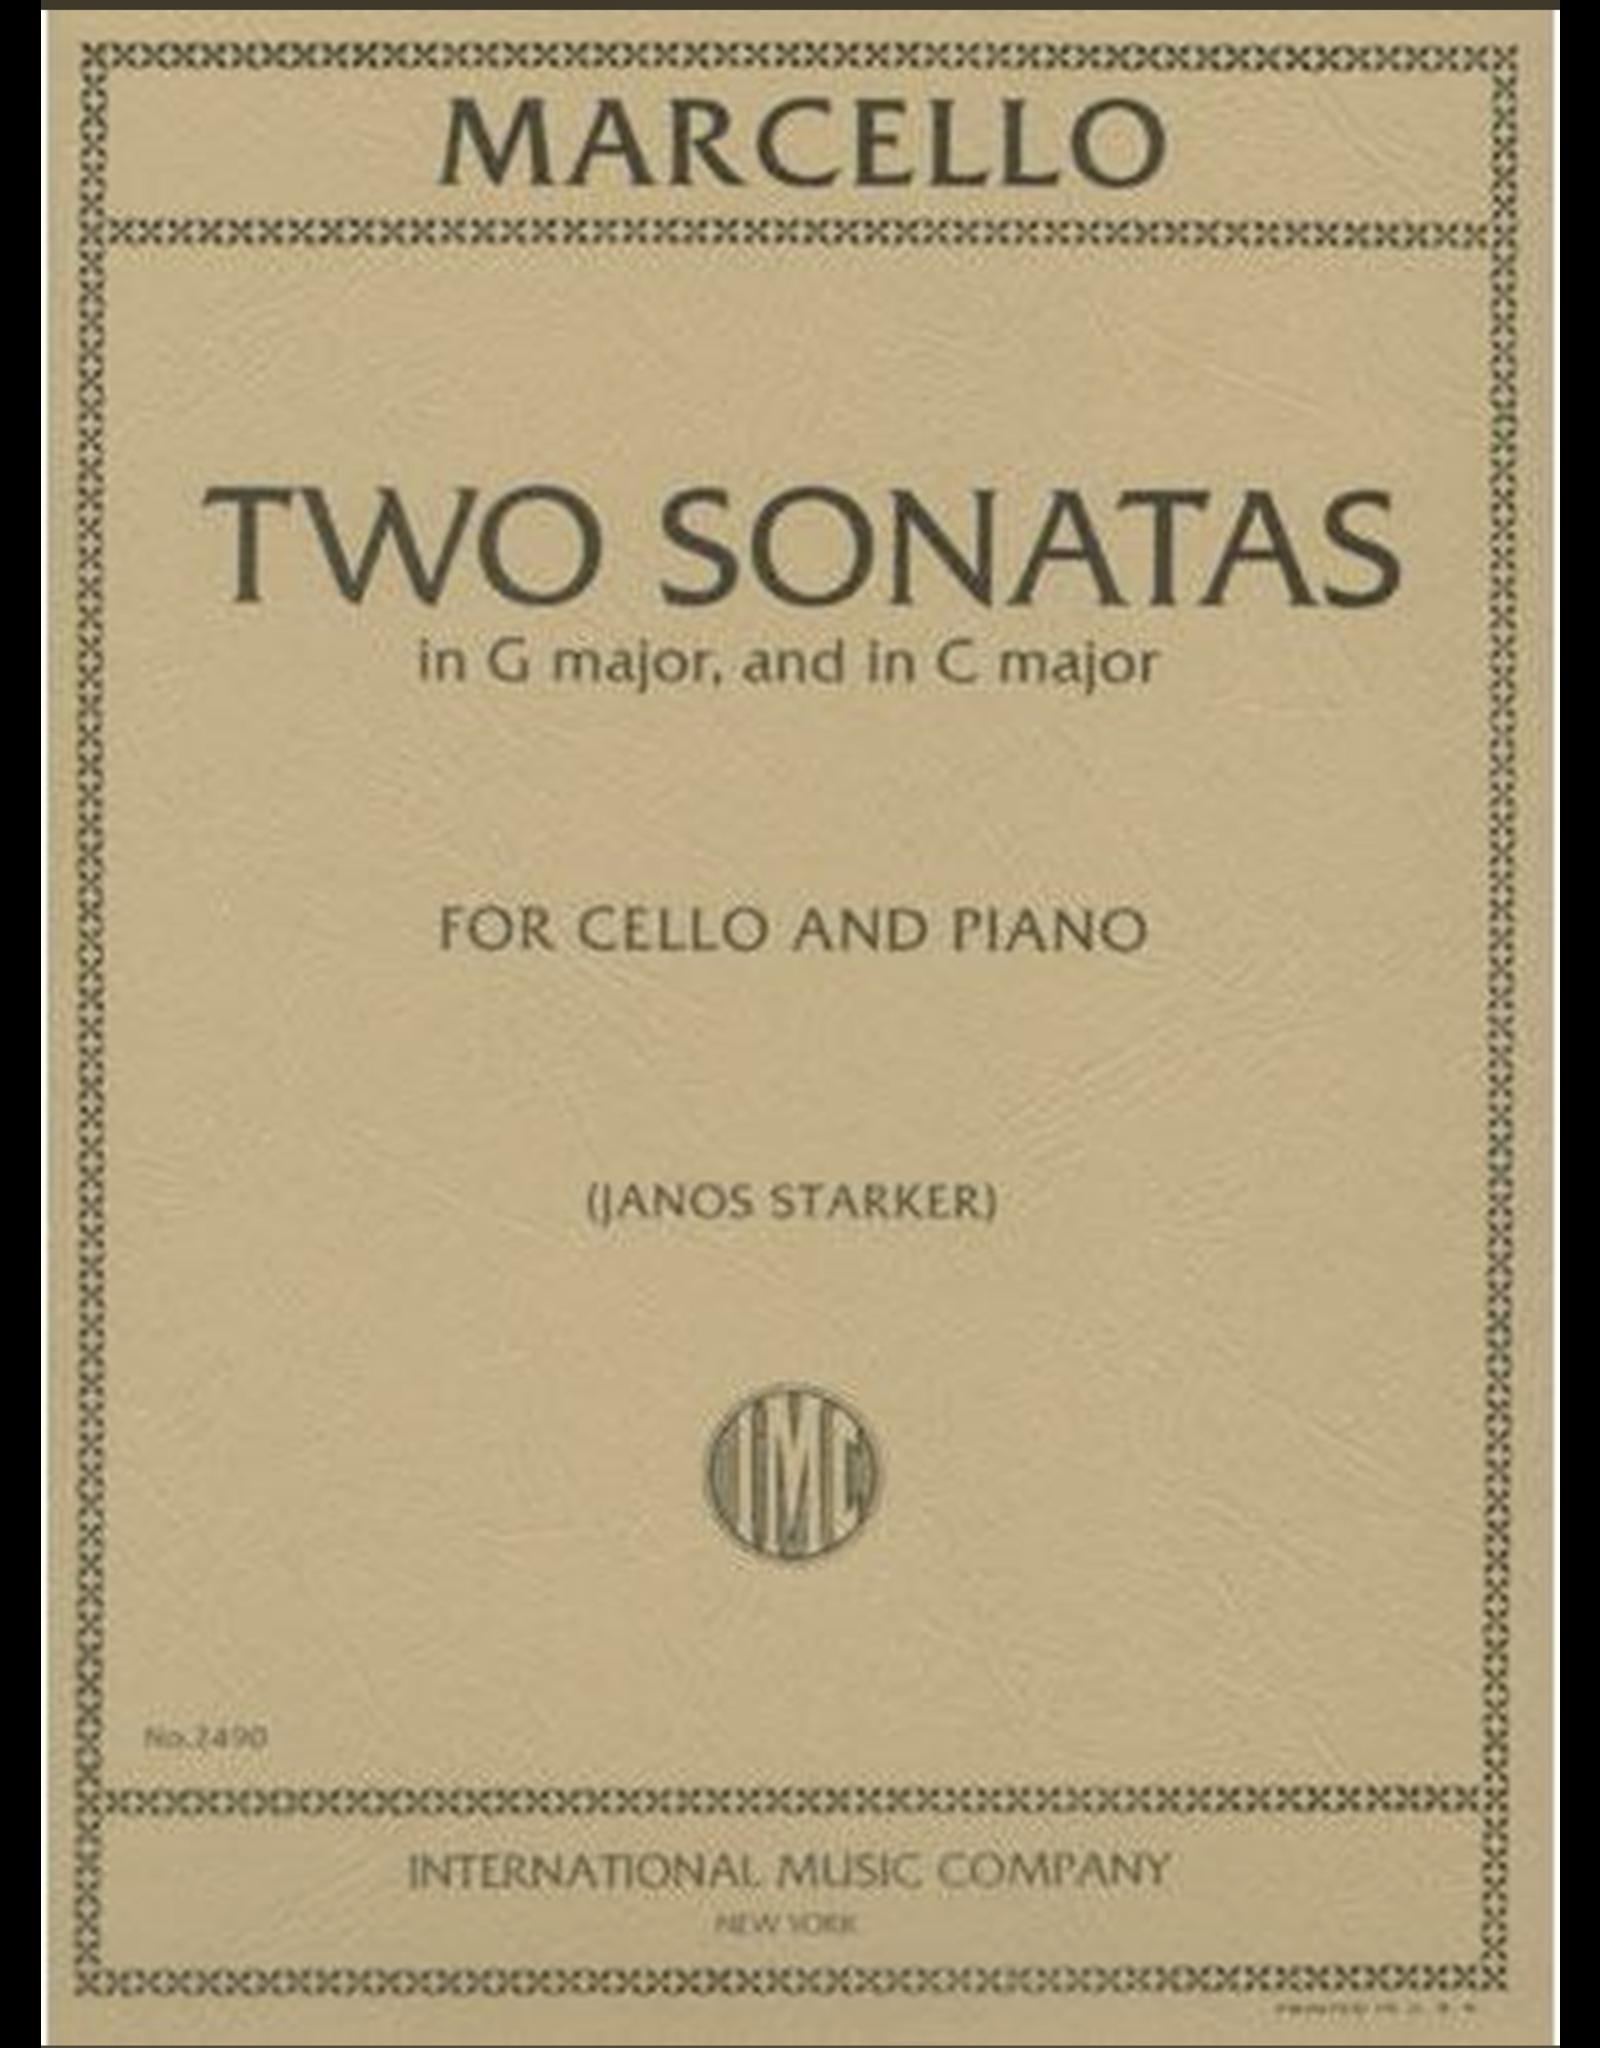 International Marcello - 2 Sonatas (C Major and G Major) for Cello and Piano